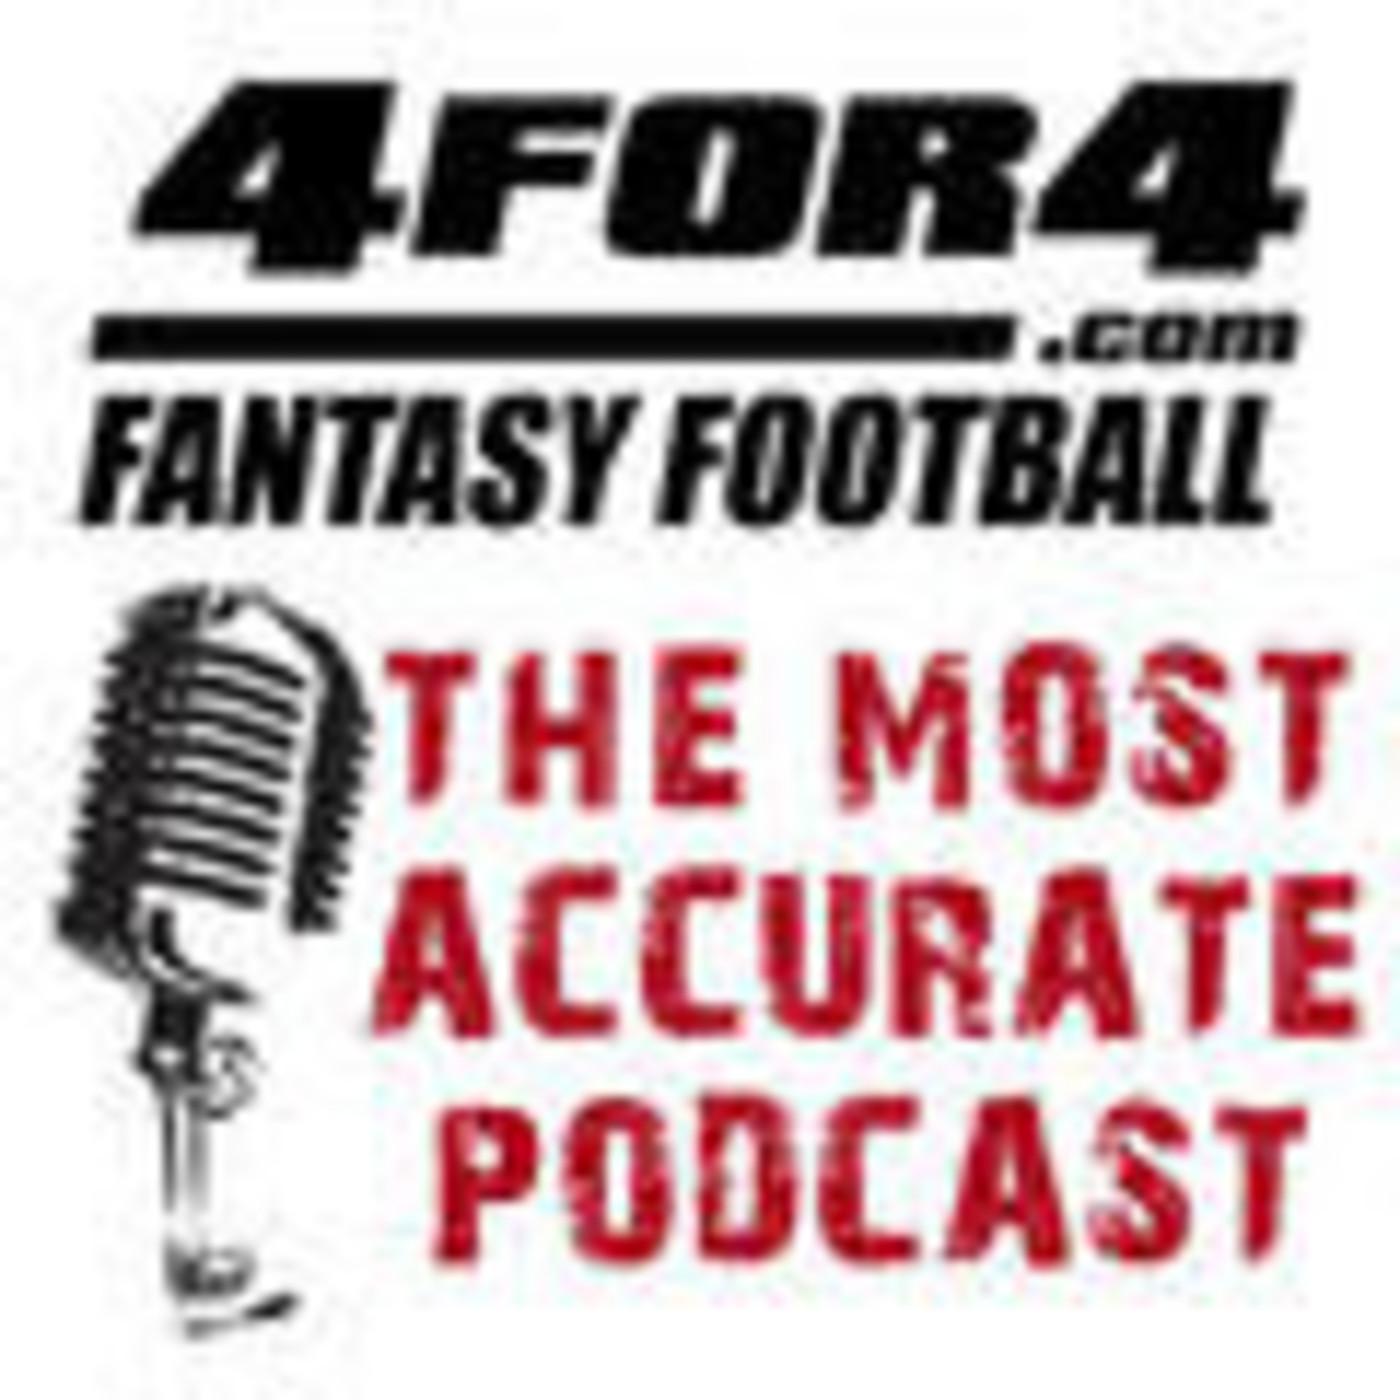 4for4 Fantasy Football